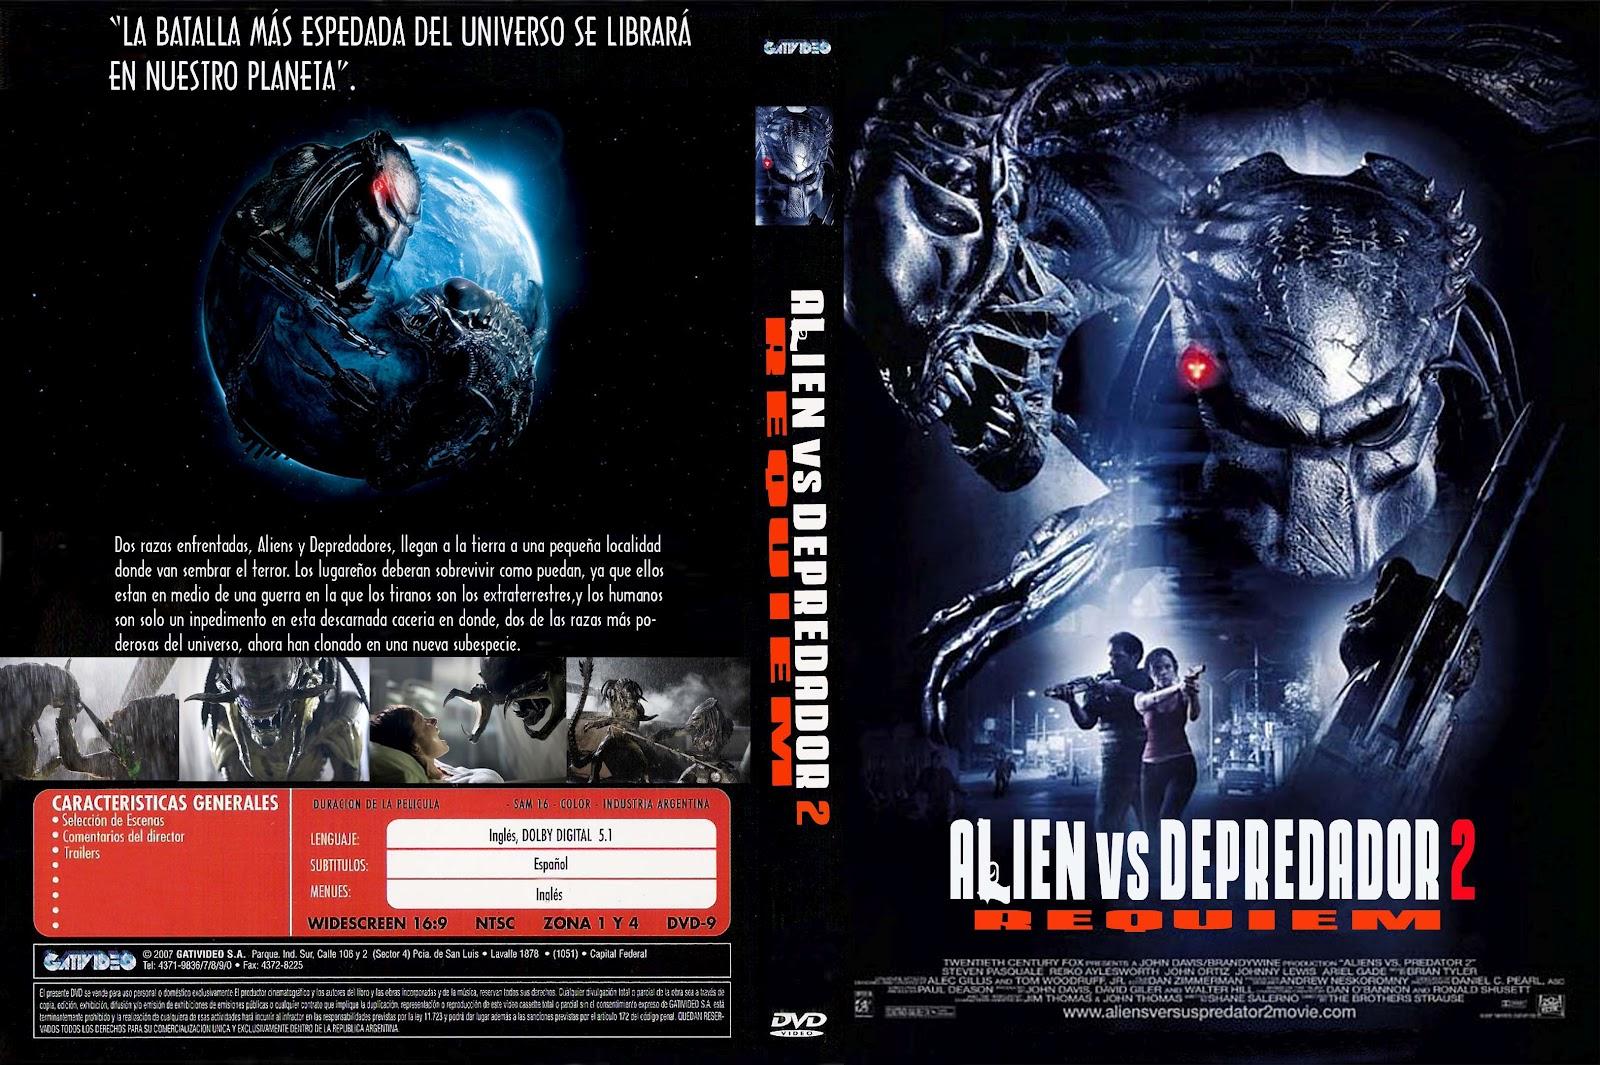 Alien vs depredador 2 alien vs predator 2